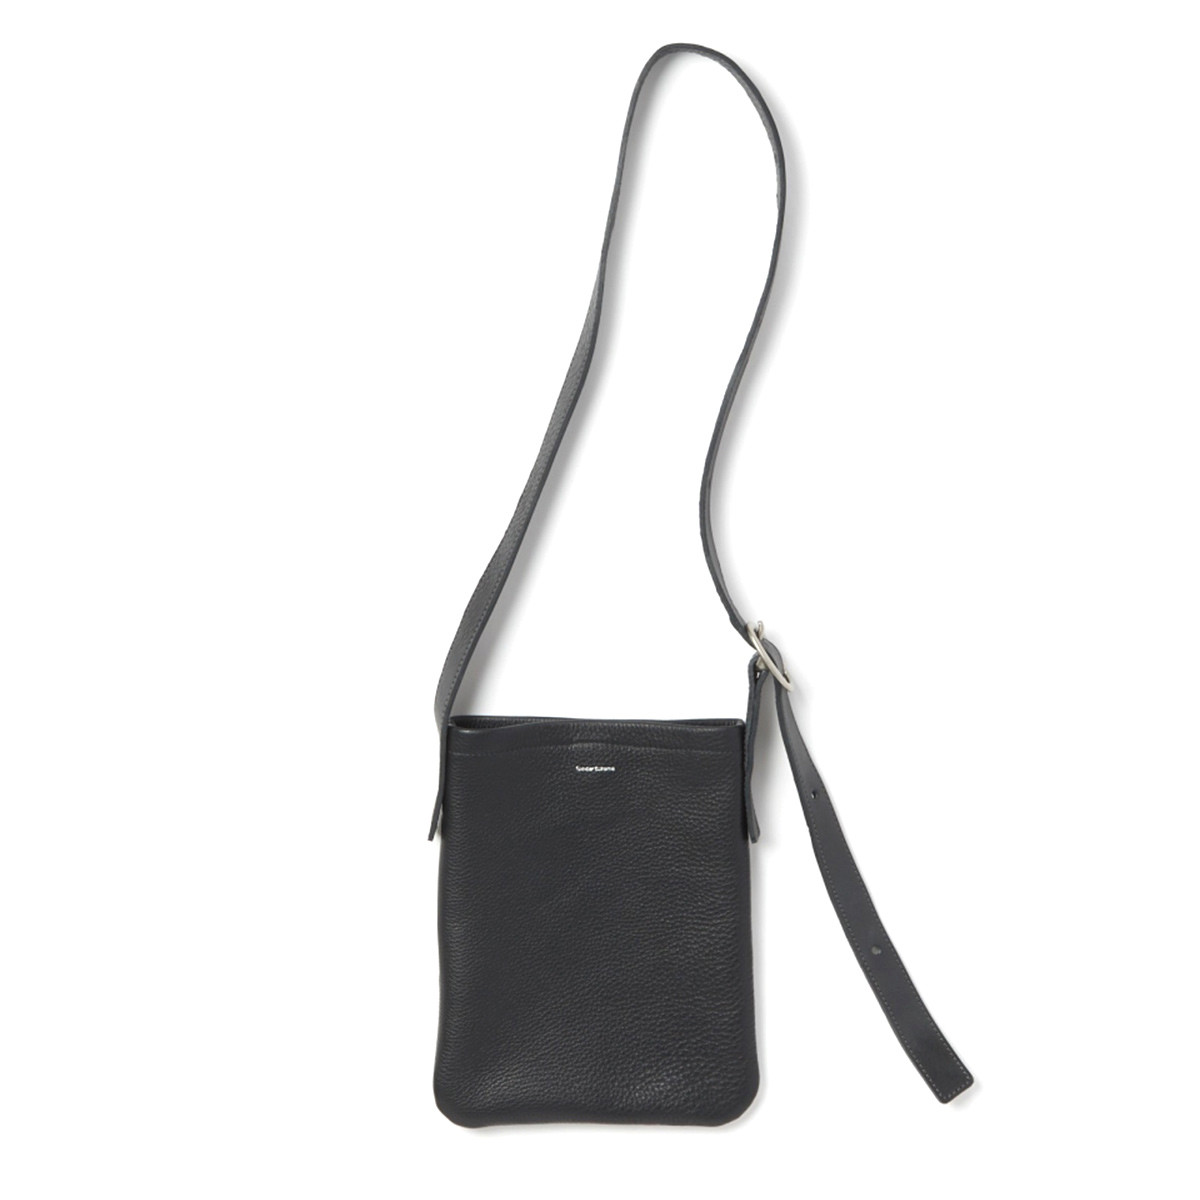 Hender Scheme / one side belt bag small -Black